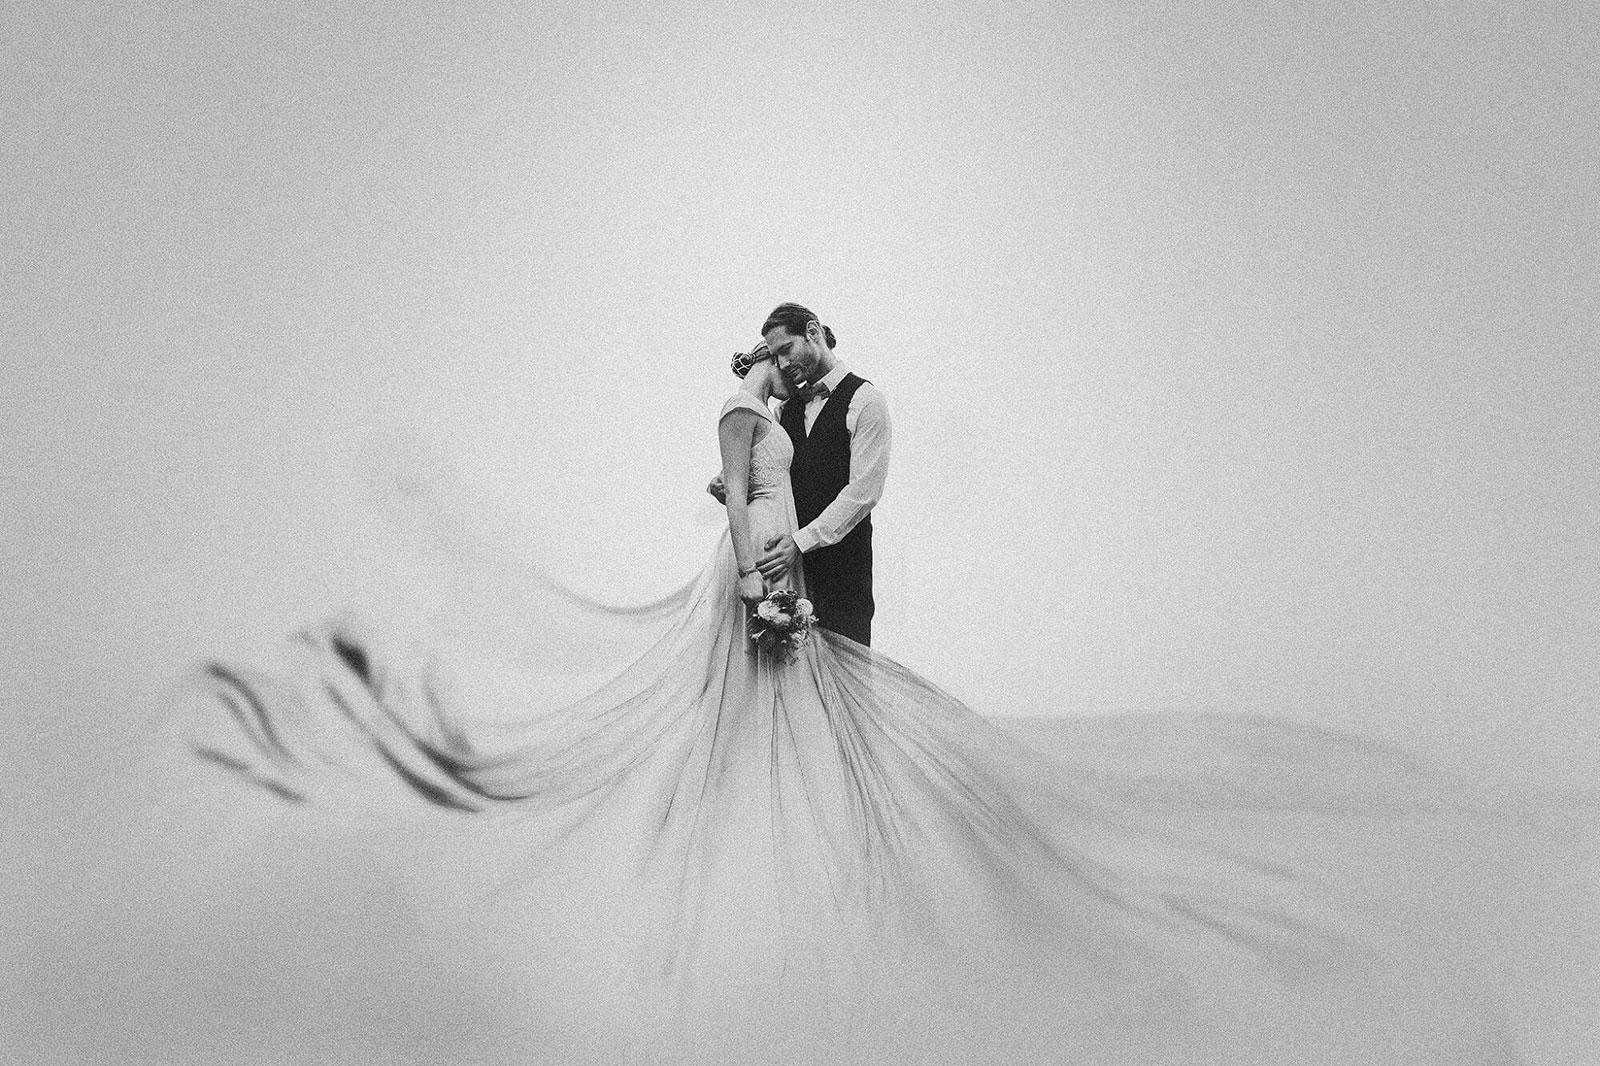 foto: ©Victor Hamke - Germany (Wedding)